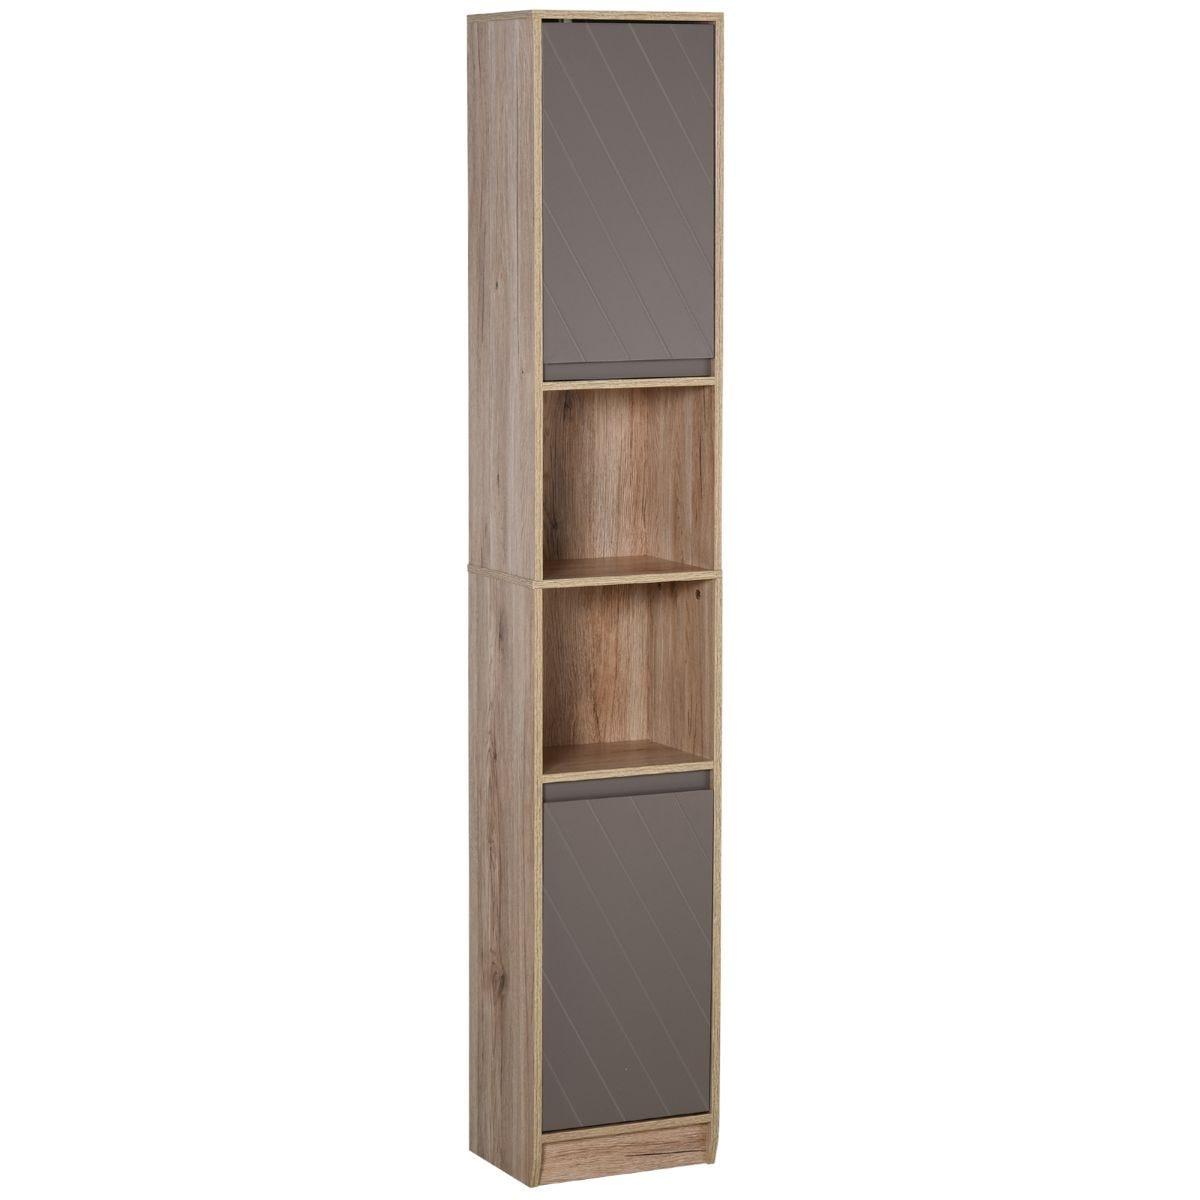 170cm Freestanding Storage Cabinet Slimline Unit With 2 Cupboards 2 Shelves